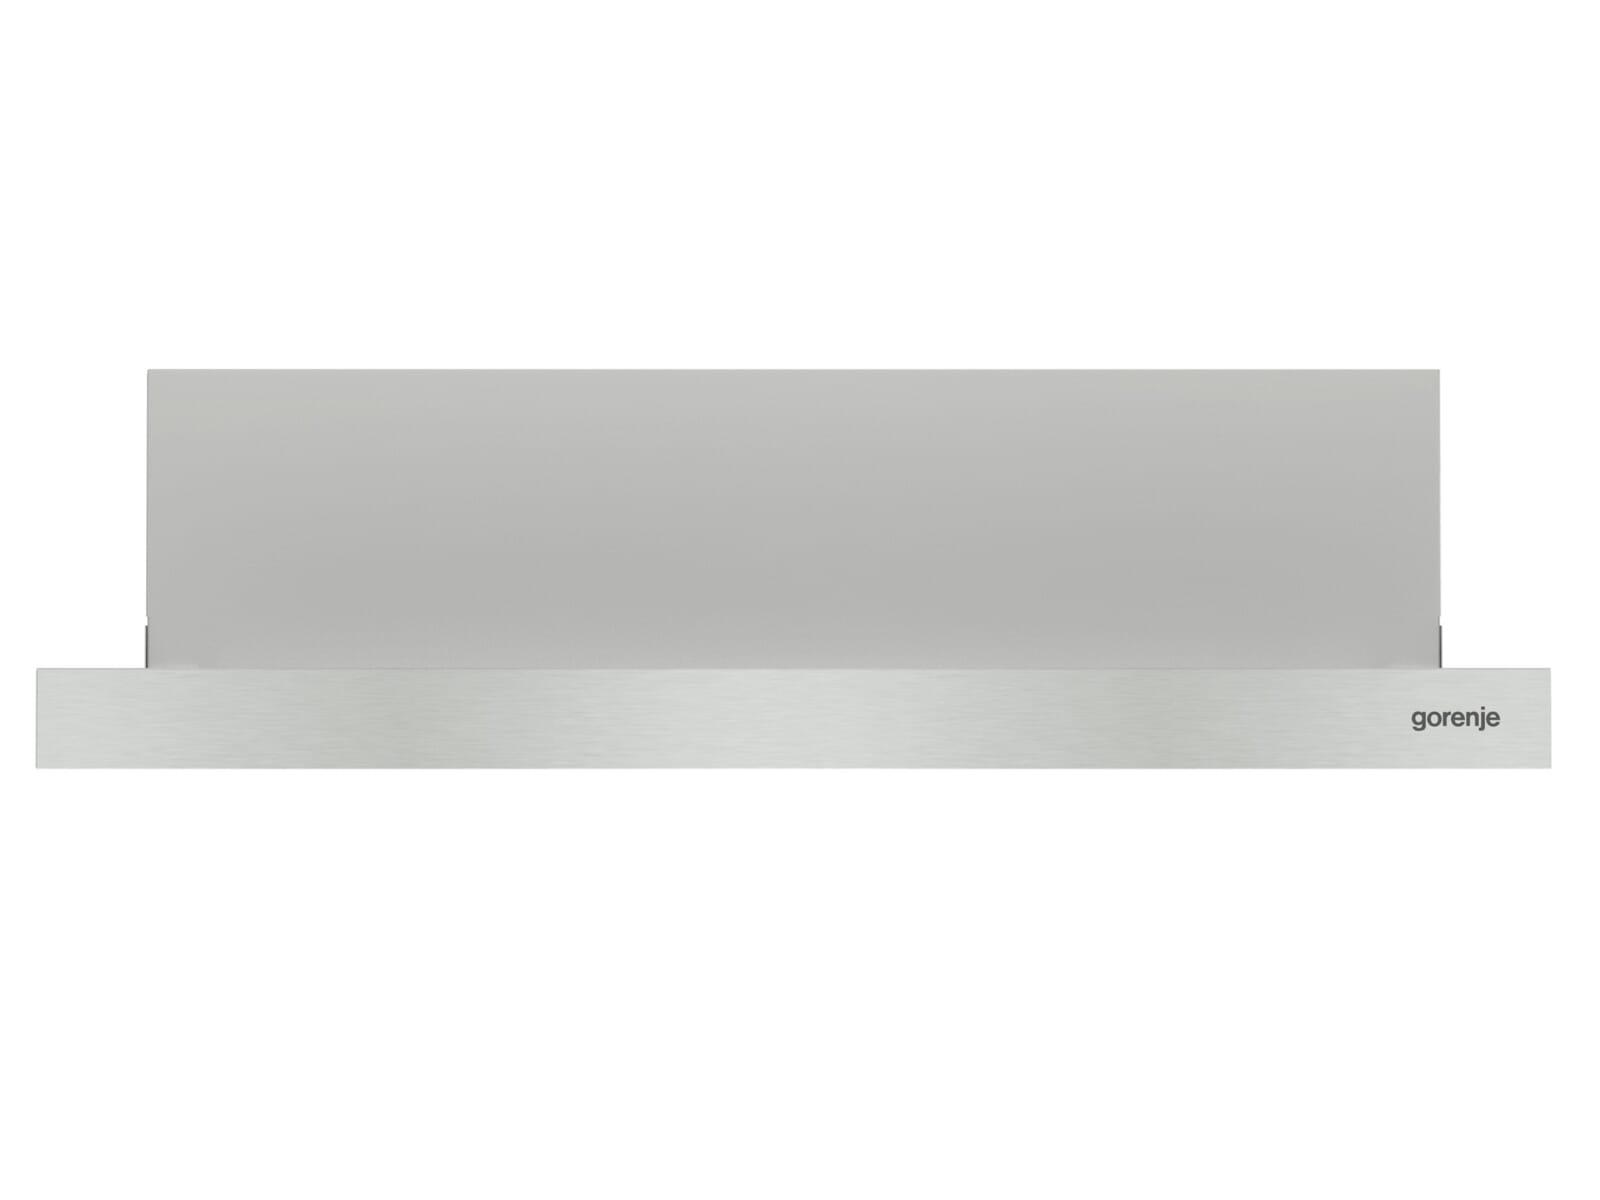 Gorenje TH62E3X Flachschirm-Dunstabzugshaube 60 cm Edelstahl